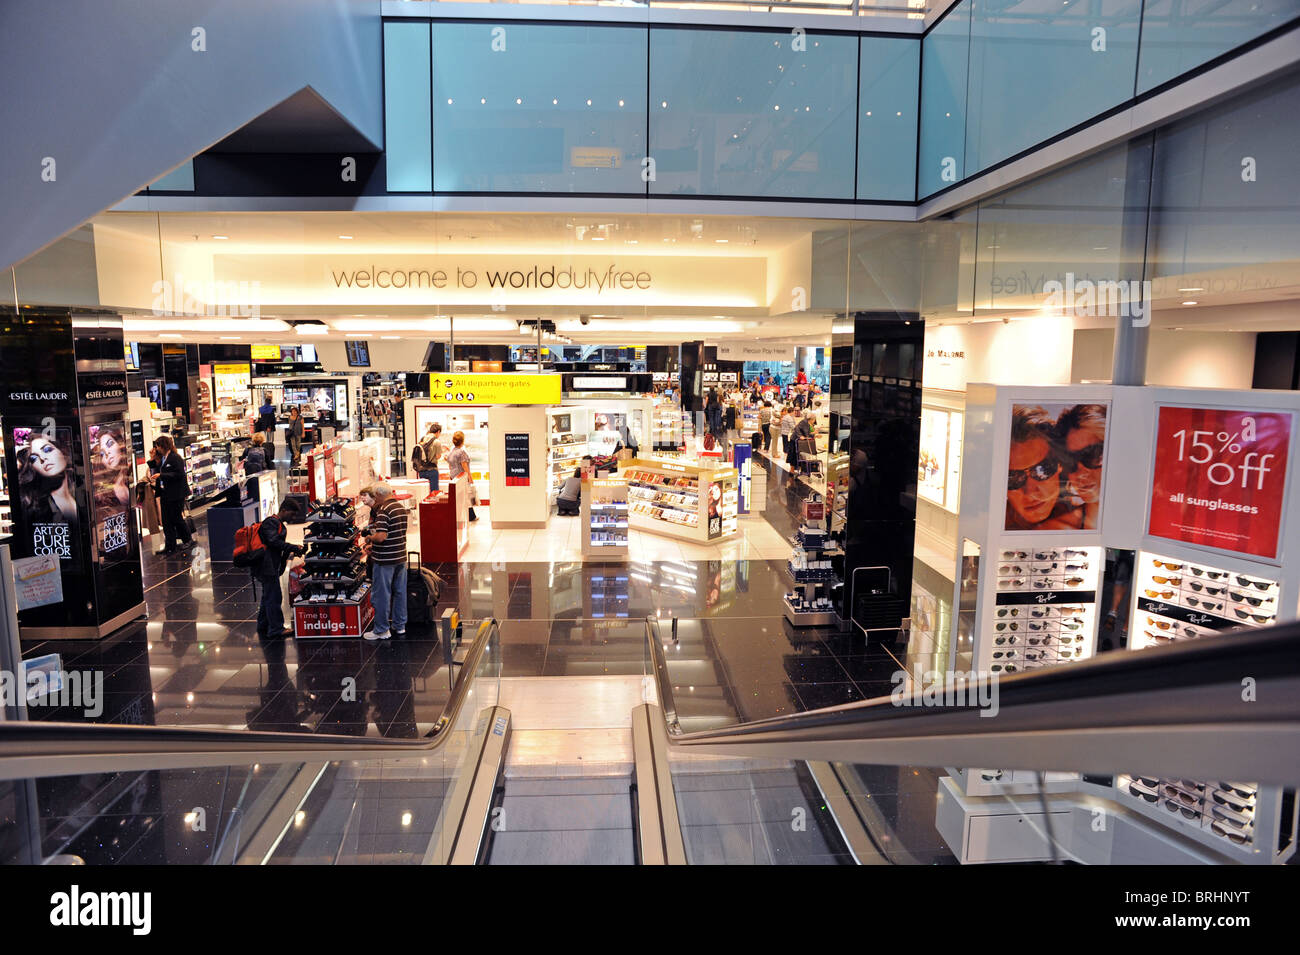 Duty free shopping at Heathrow Terminal 5 - Stock Image